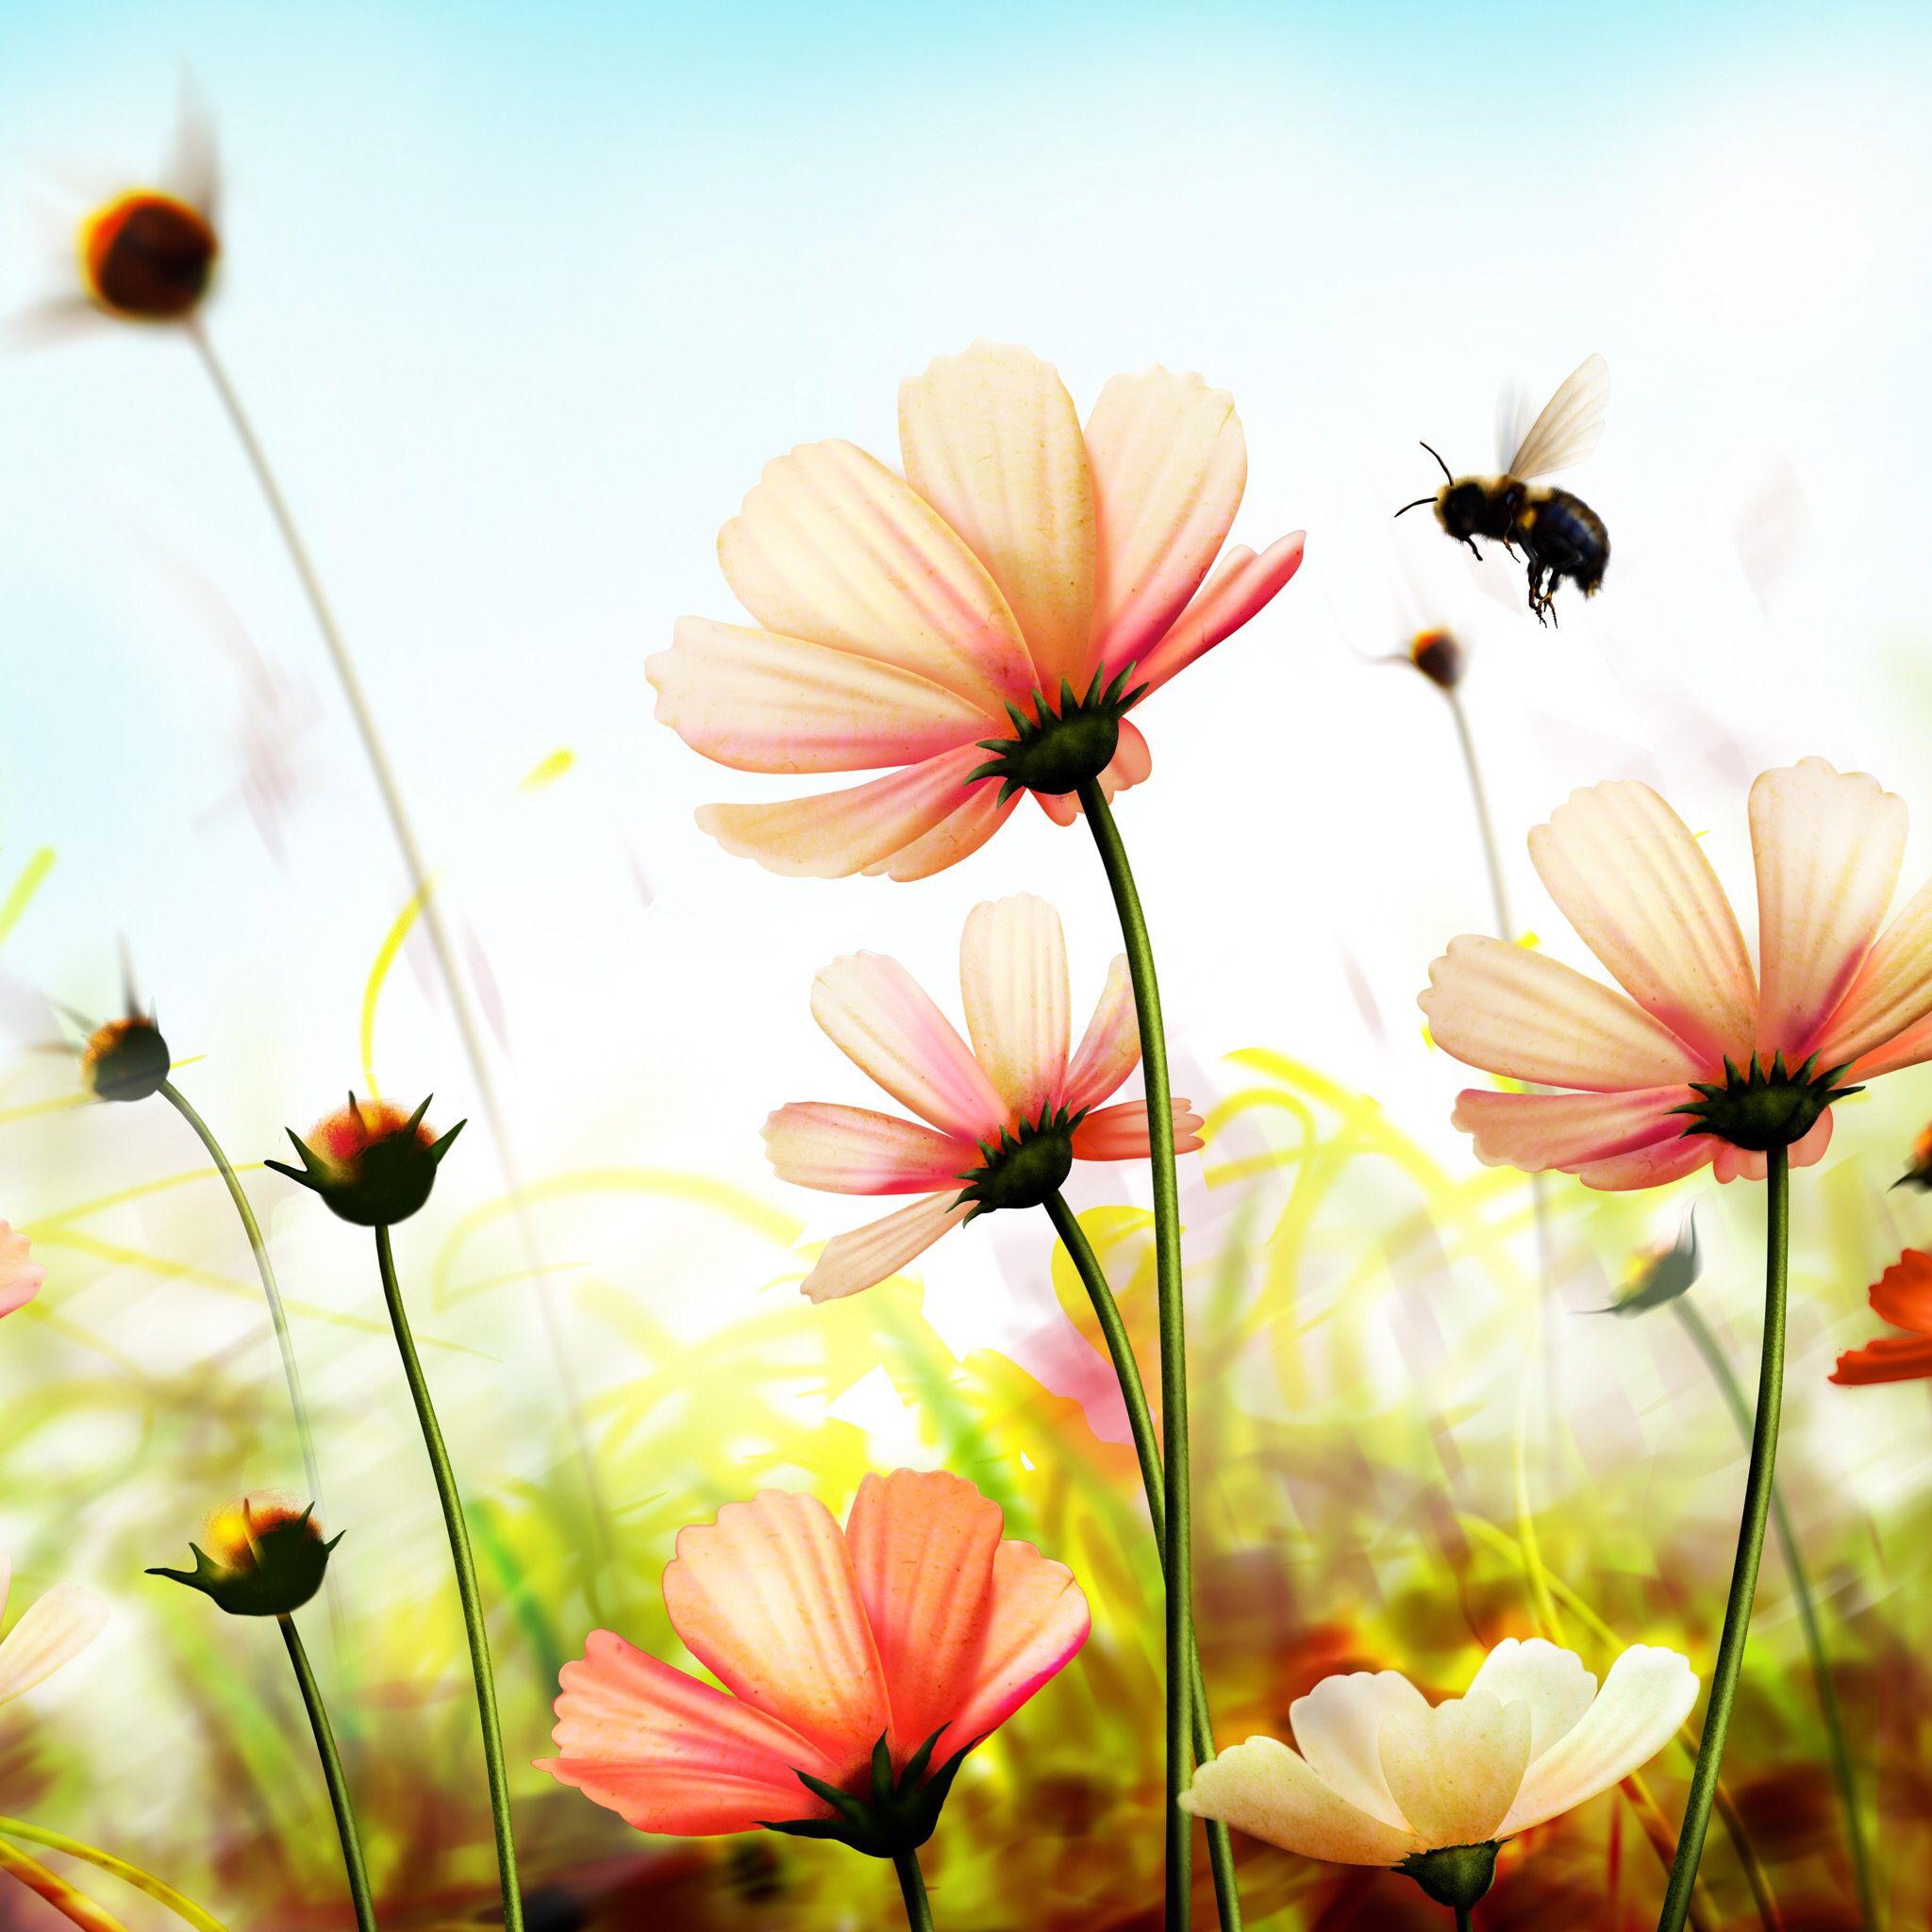 Pin By Leeanna Michael On Flower Flower Wallpaper Nature Wallpaper Spring Wallpaper